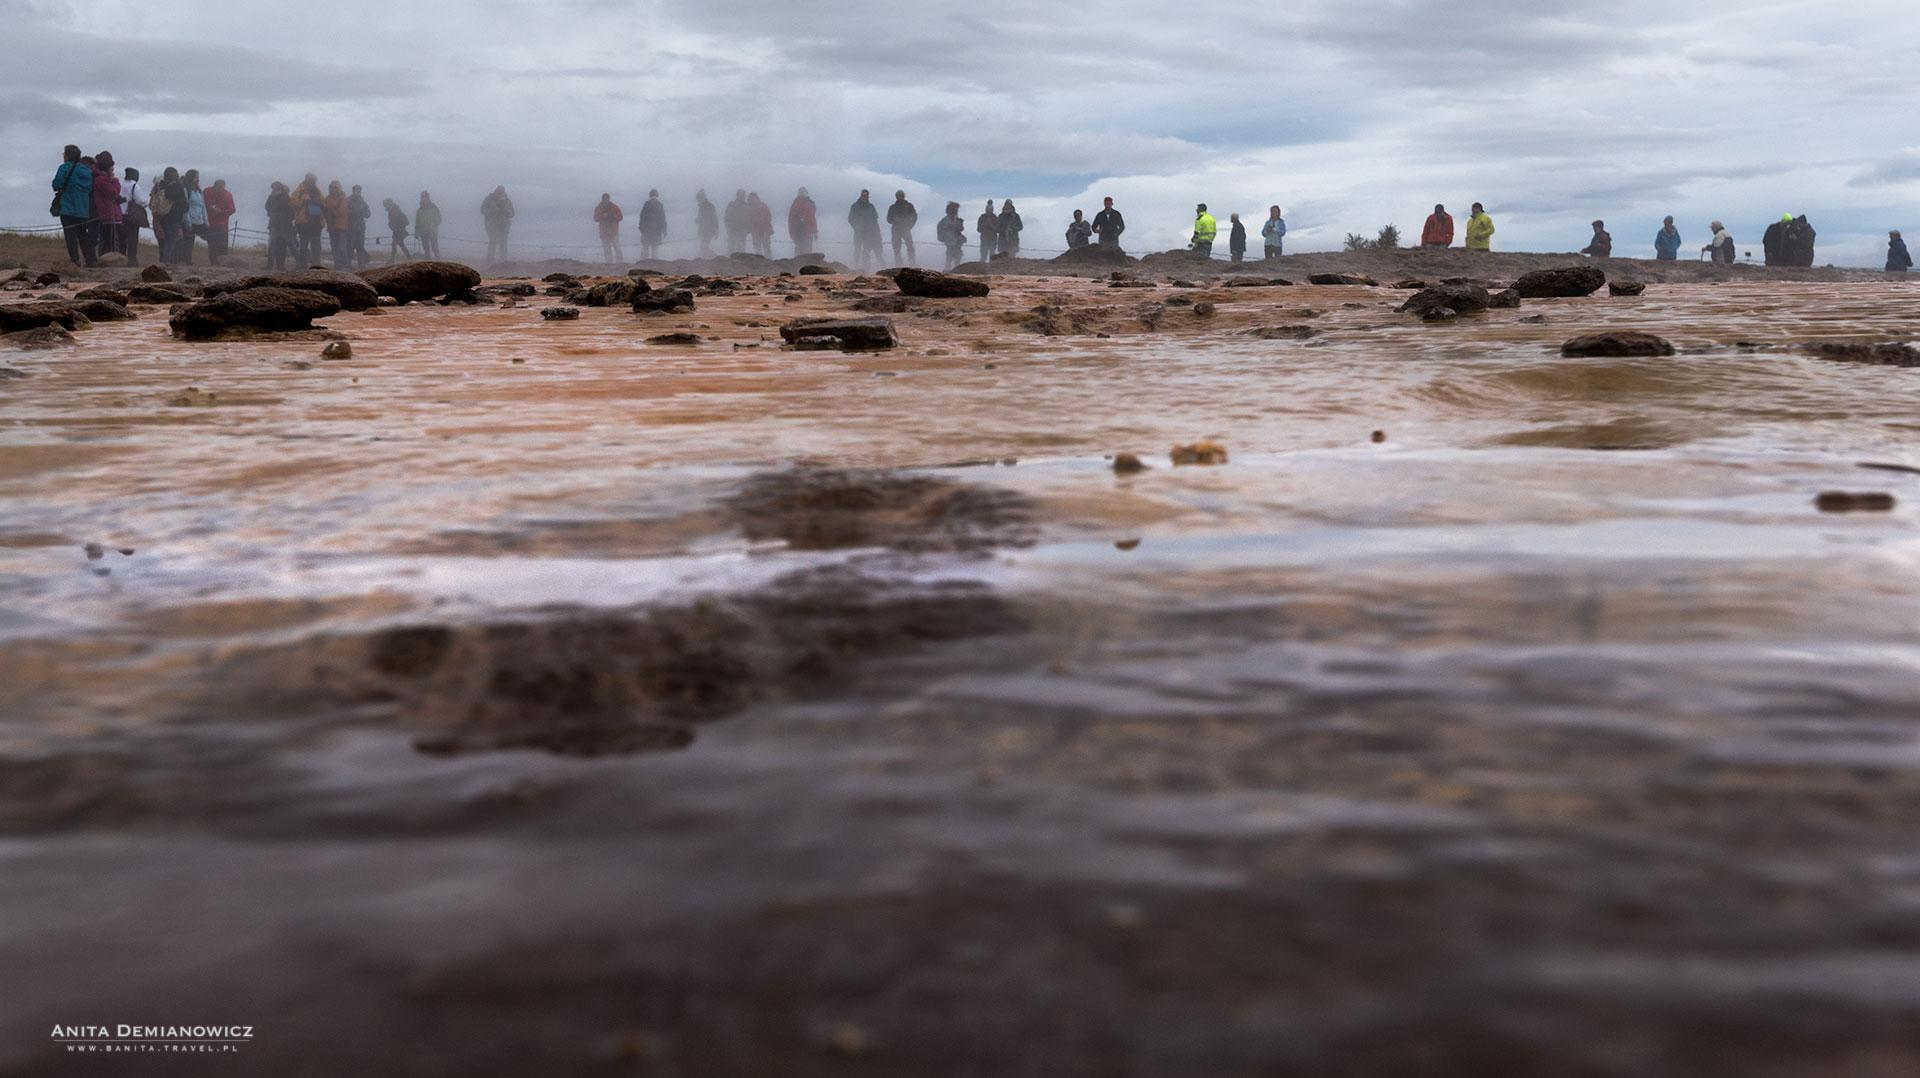 Geysir, Golden Circle, Islandia, Anita Demianowicz